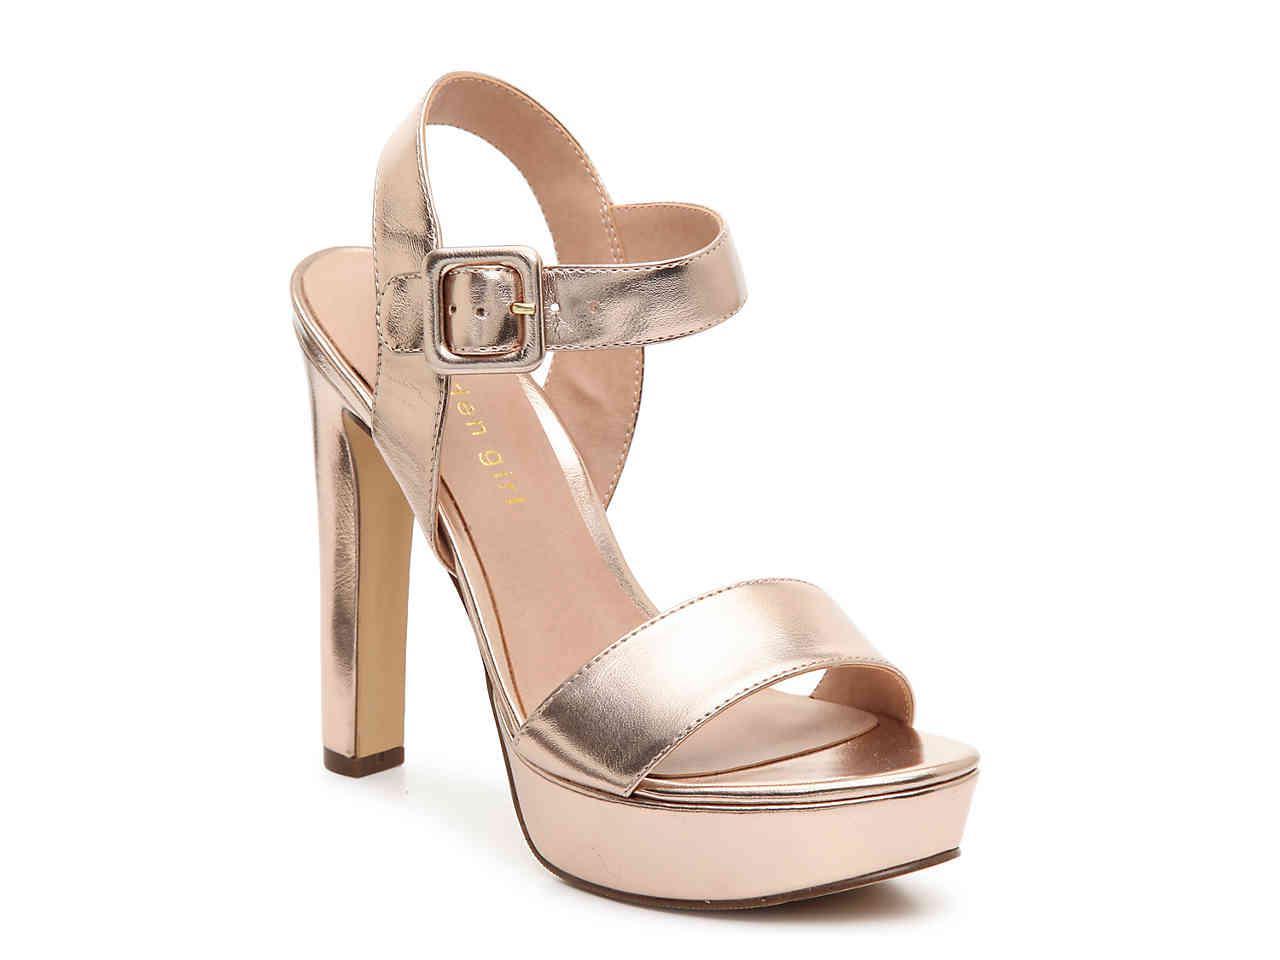 94fc72cefa86 Lyst - Madden Girl Rollo Platform Sandal in Metallic